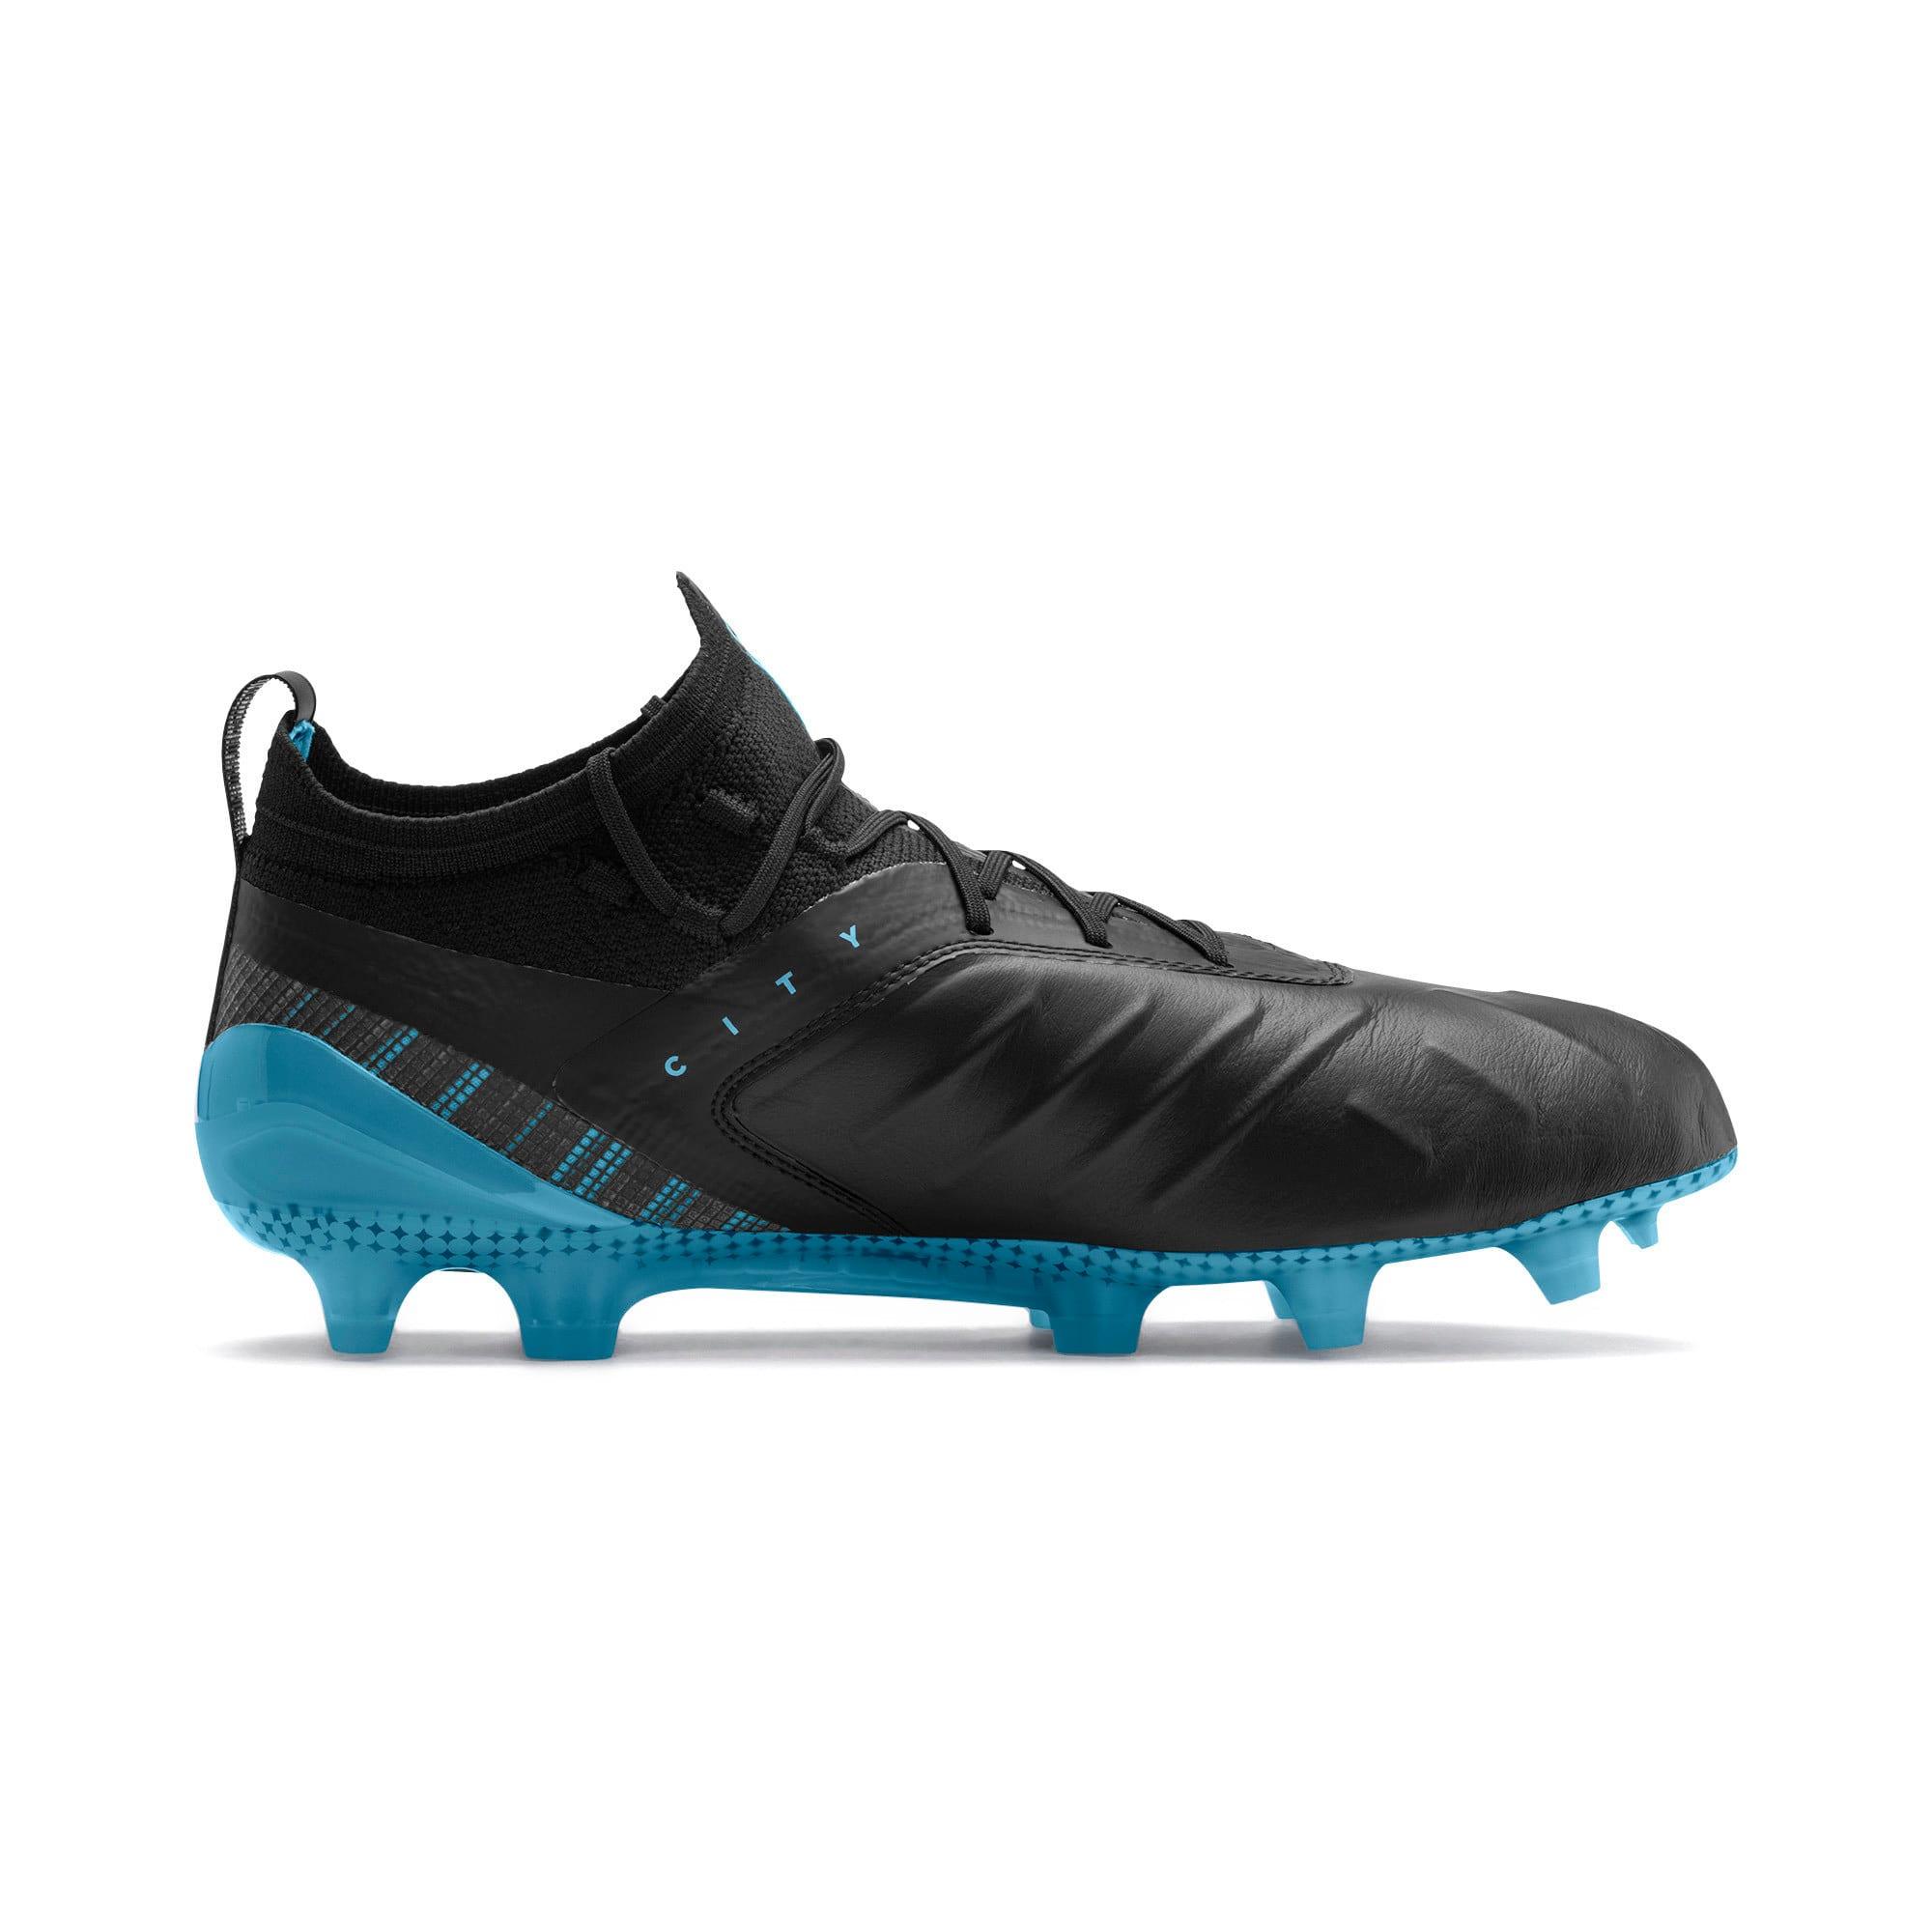 Thumbnail 6 of PUMA ONE 5.1 City FG/AG Men's Soccer Cleats, Black-Sky Blue-Silver, medium